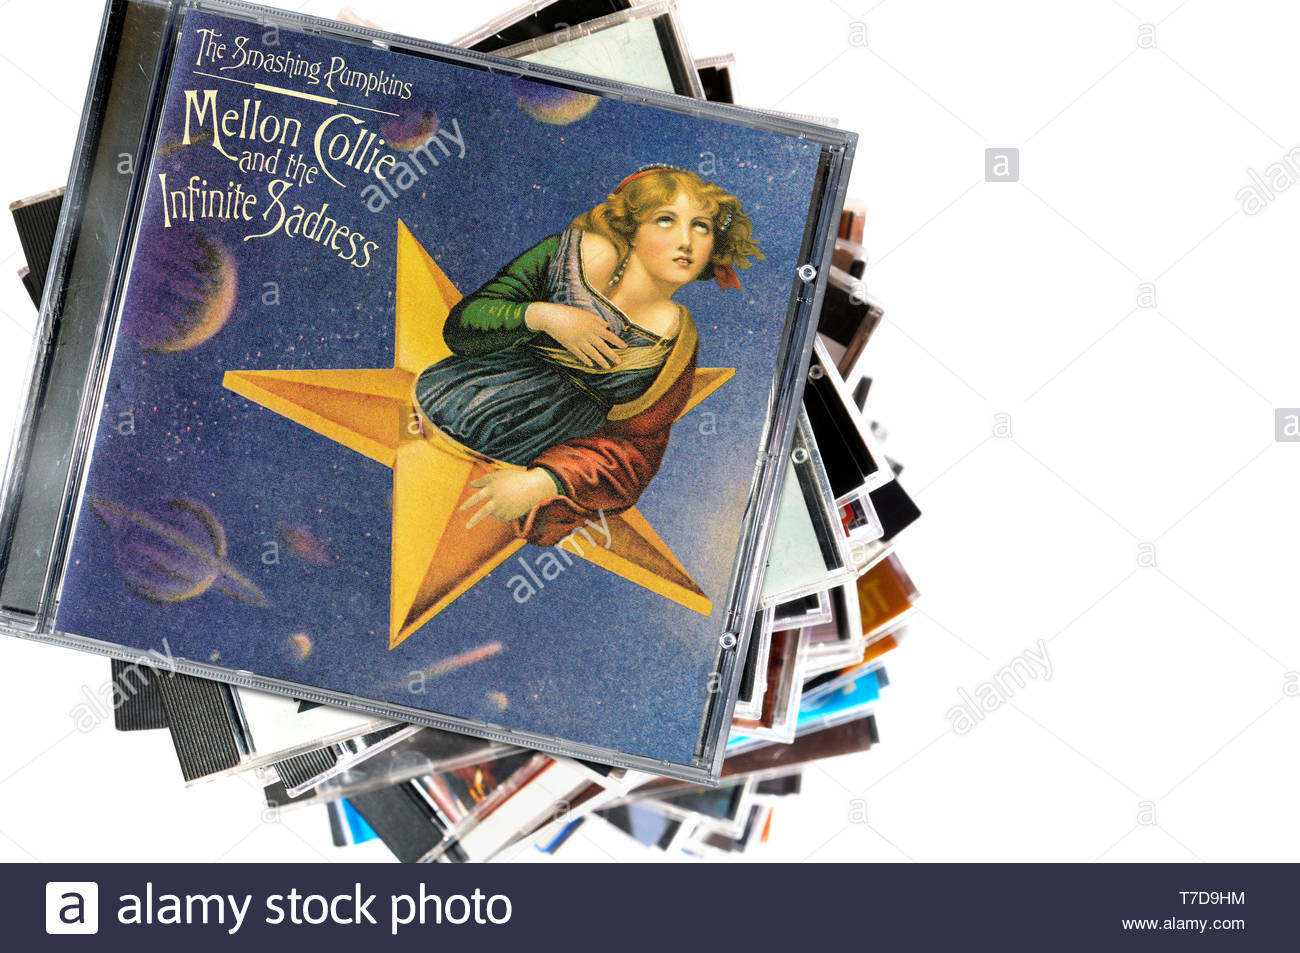 The Smashing Pumpkins, Mellon Collie and the Infinite Sadness album, CD music collection cases, England - Stock Image